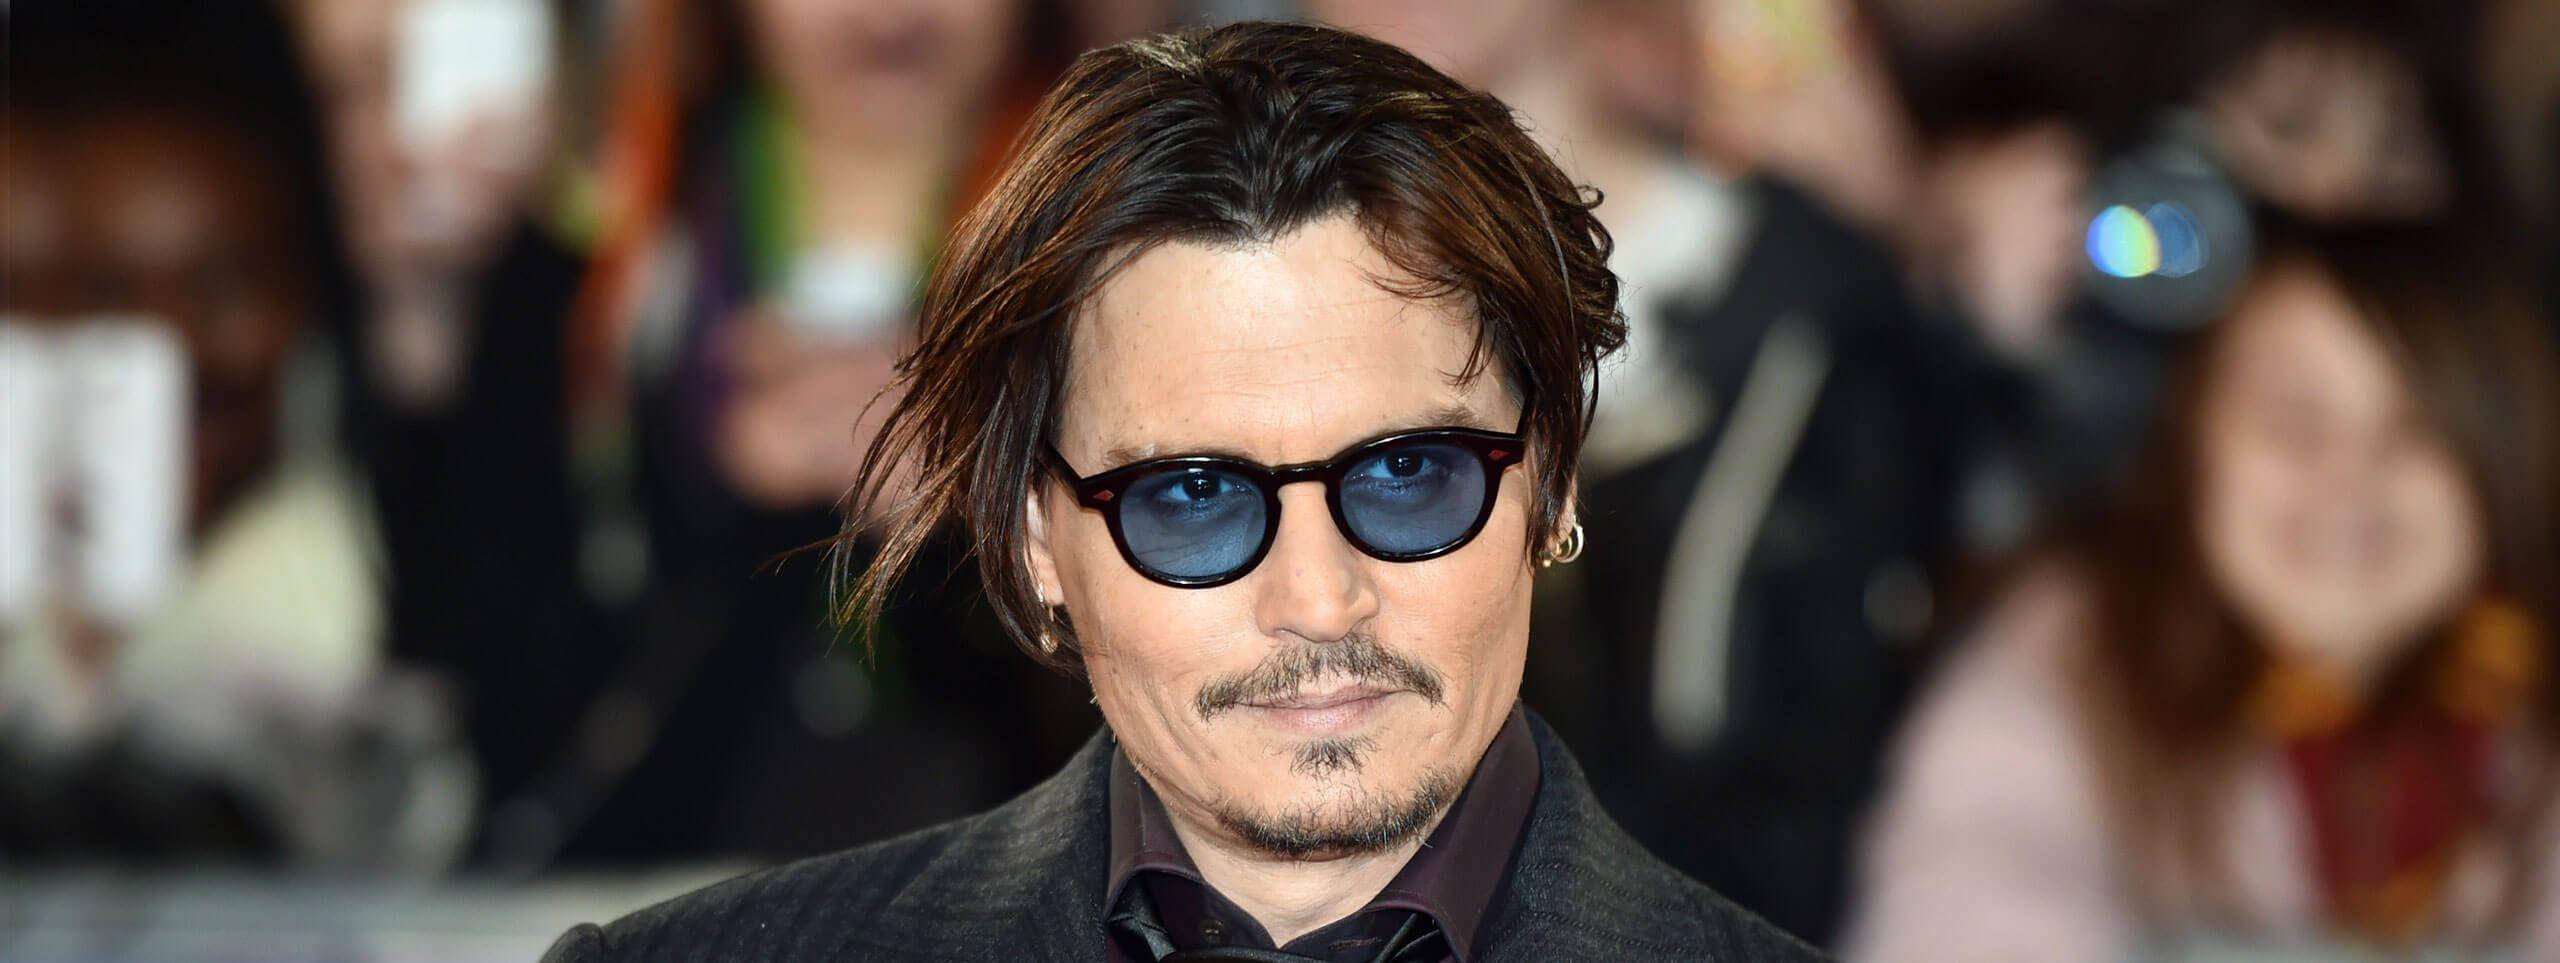 Johnny Depp trend acconciature uomo riga centrale